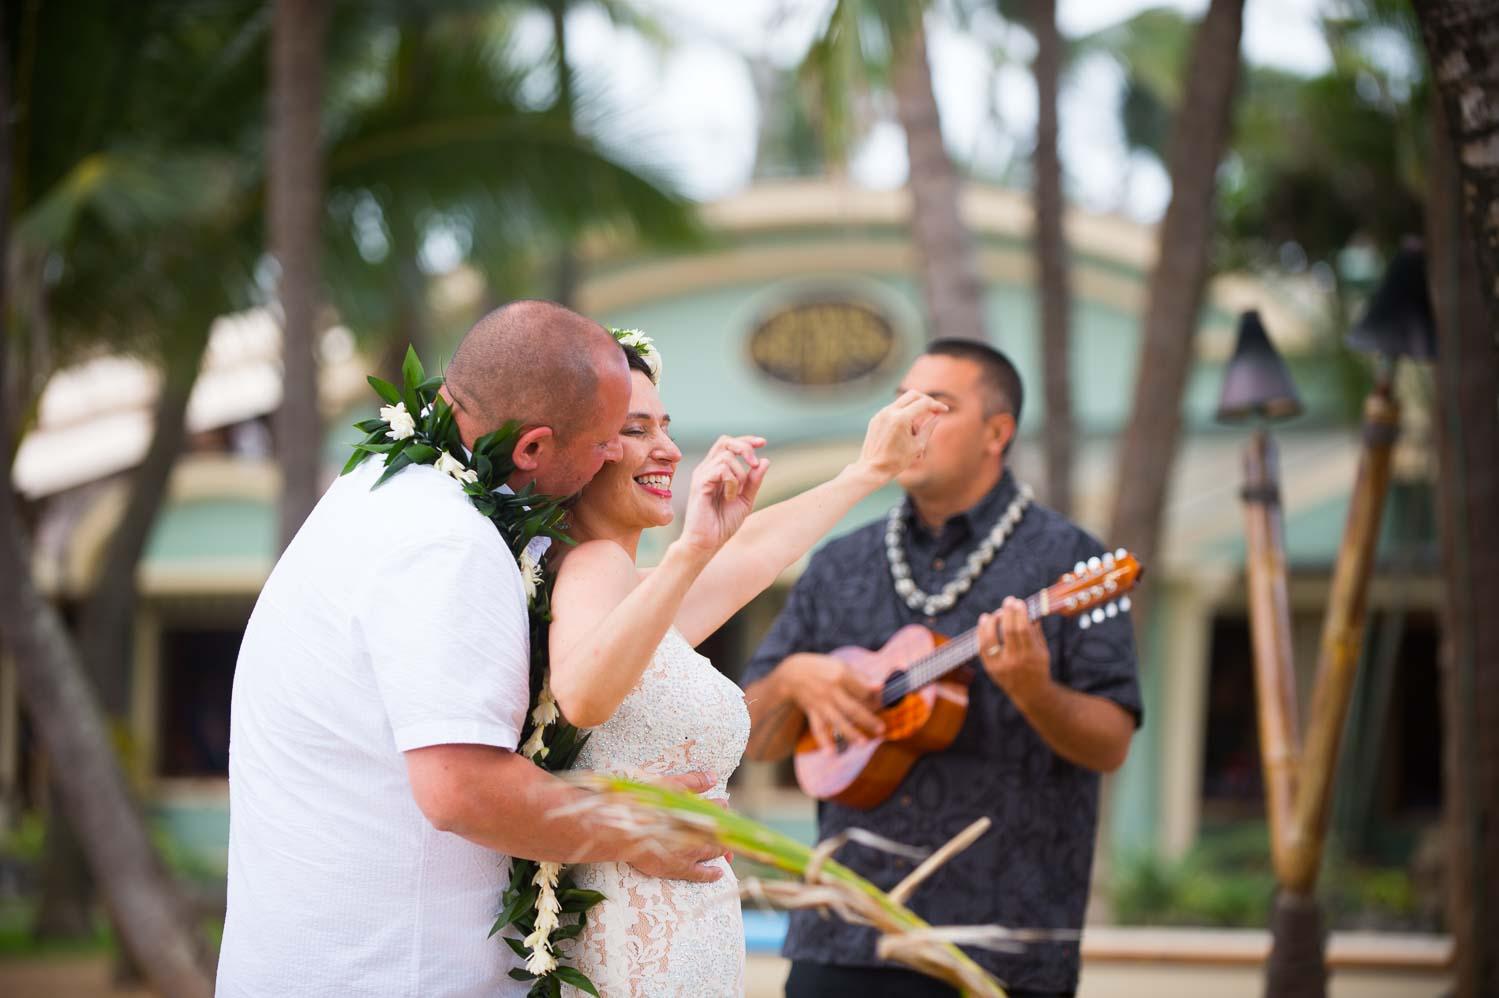 maui-wedding-photography-maui-wedding-venue-Tad-Craig-Photography-38.jpg